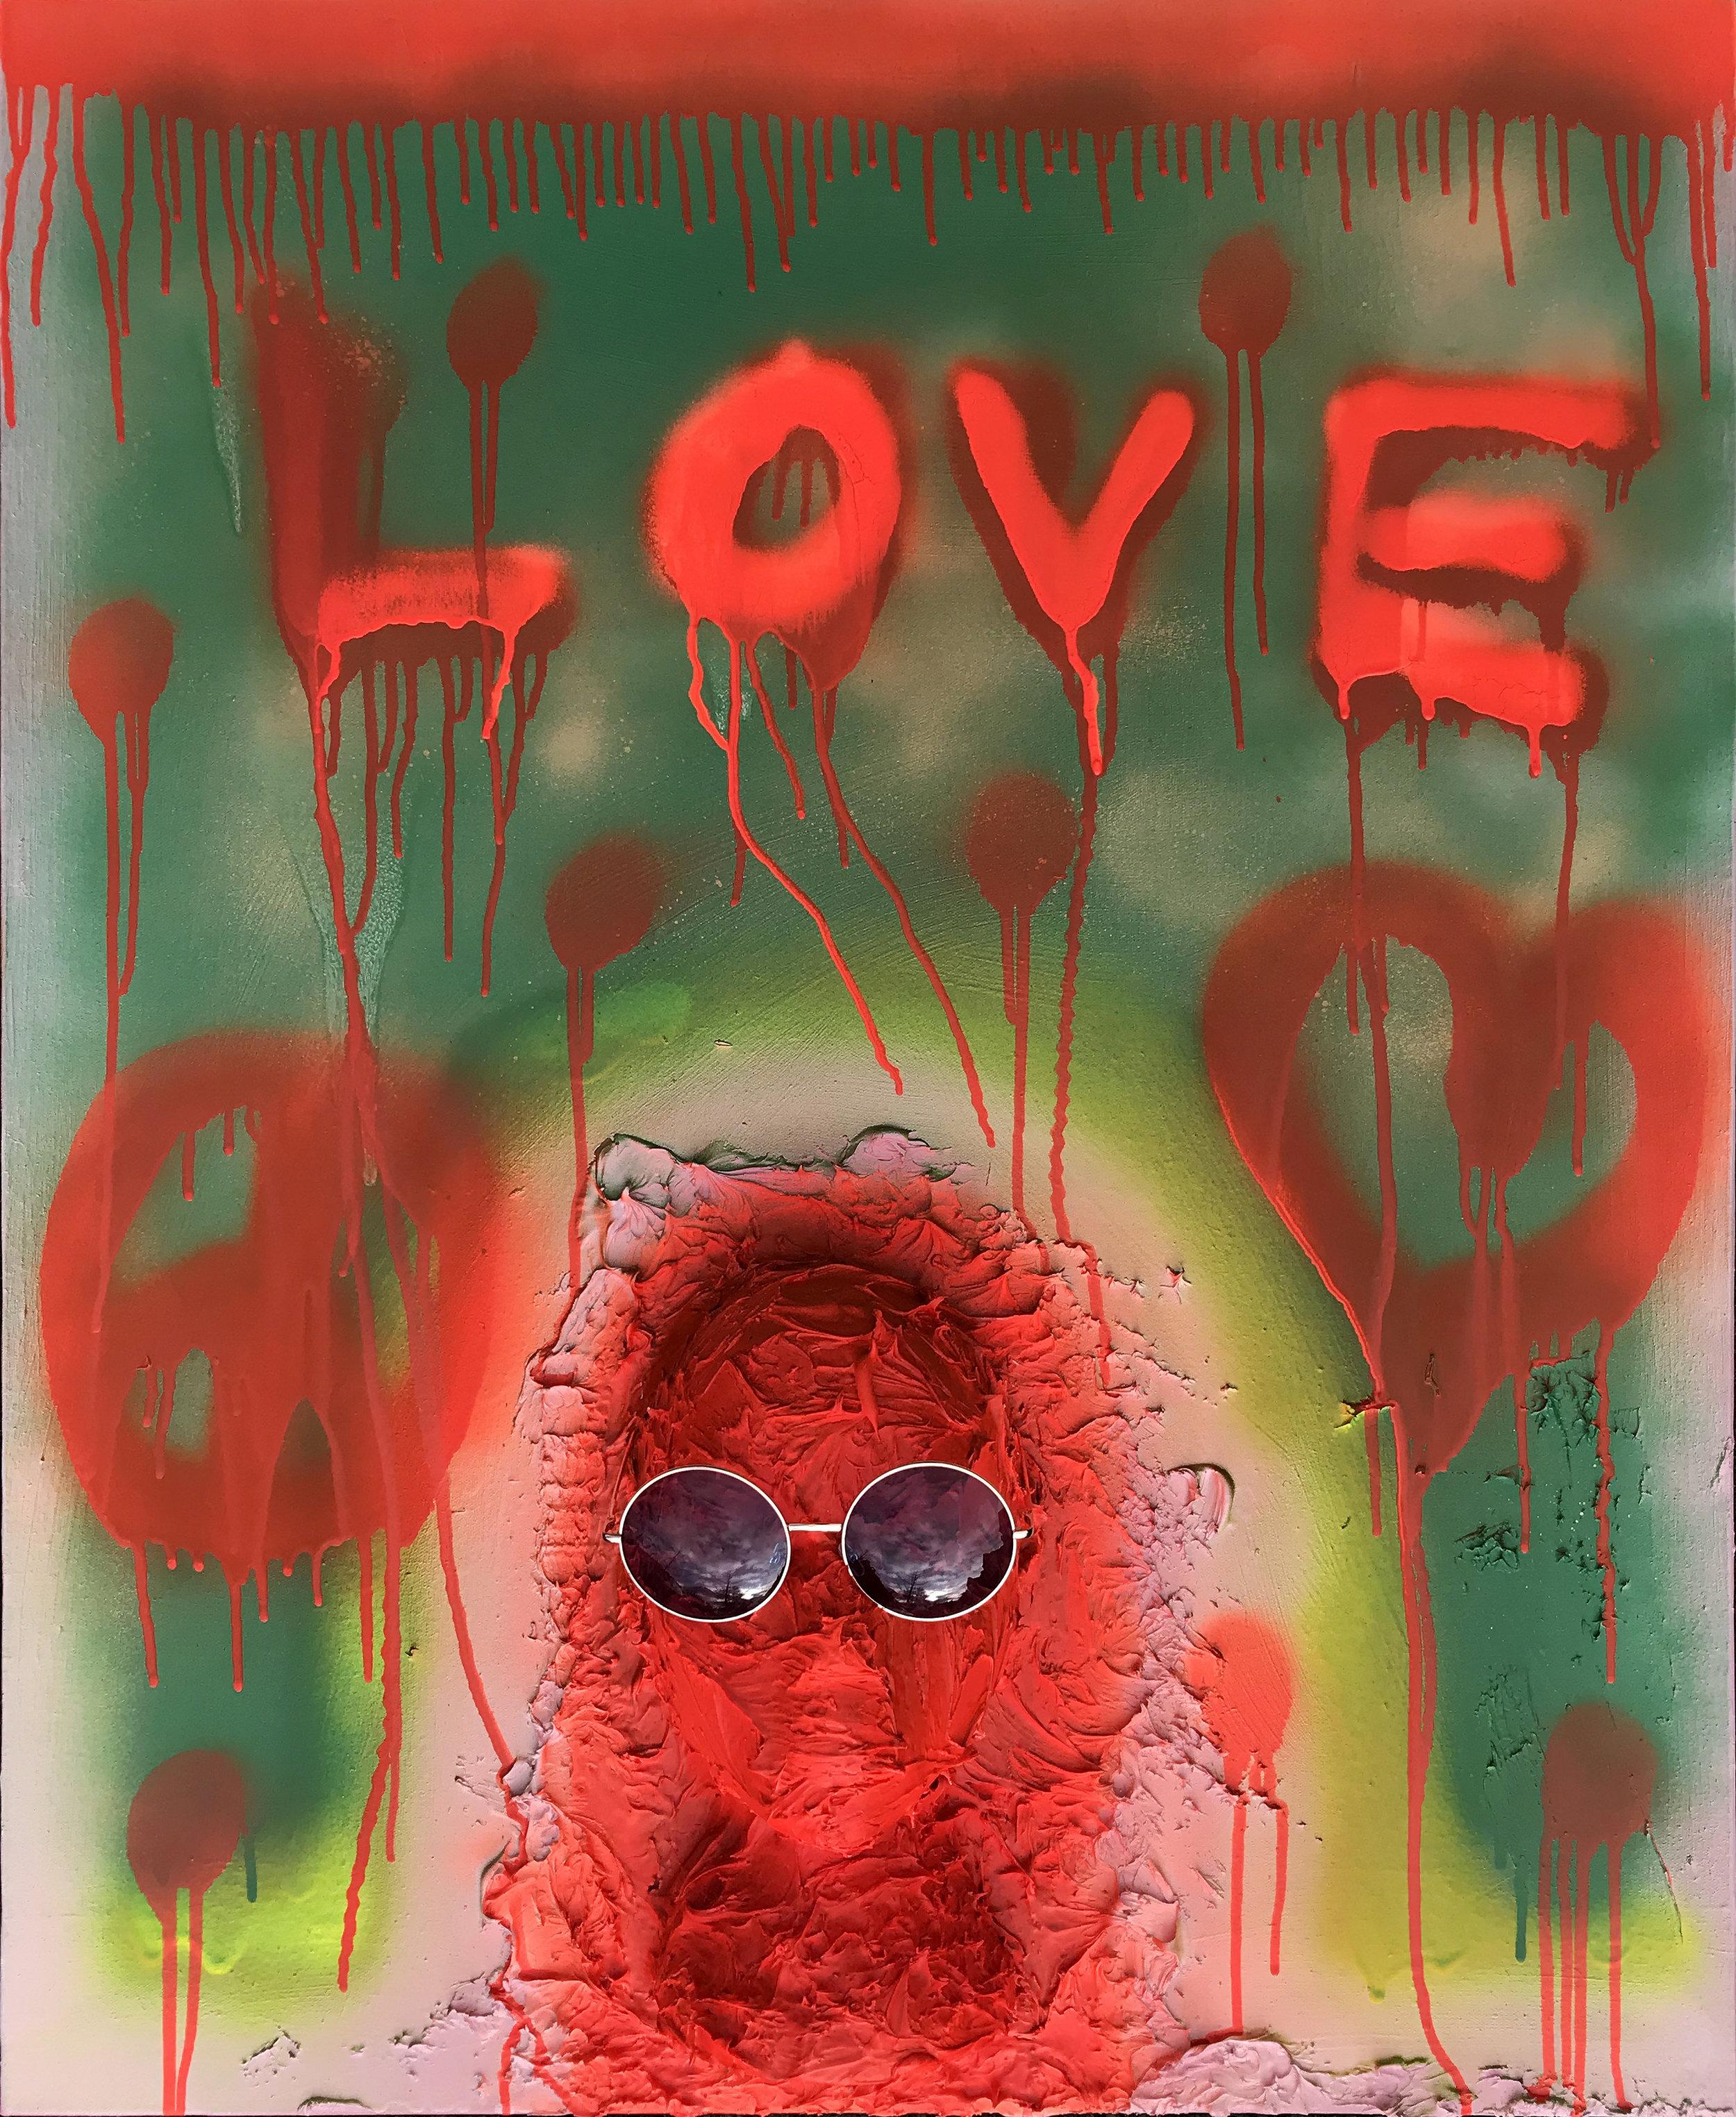 GERALD O'DOWD   John Lennon: Working Class Hero (2019) Acrylic, aerosol spray paint, polystyrene, adhesive on canvas 86 x 71 cm